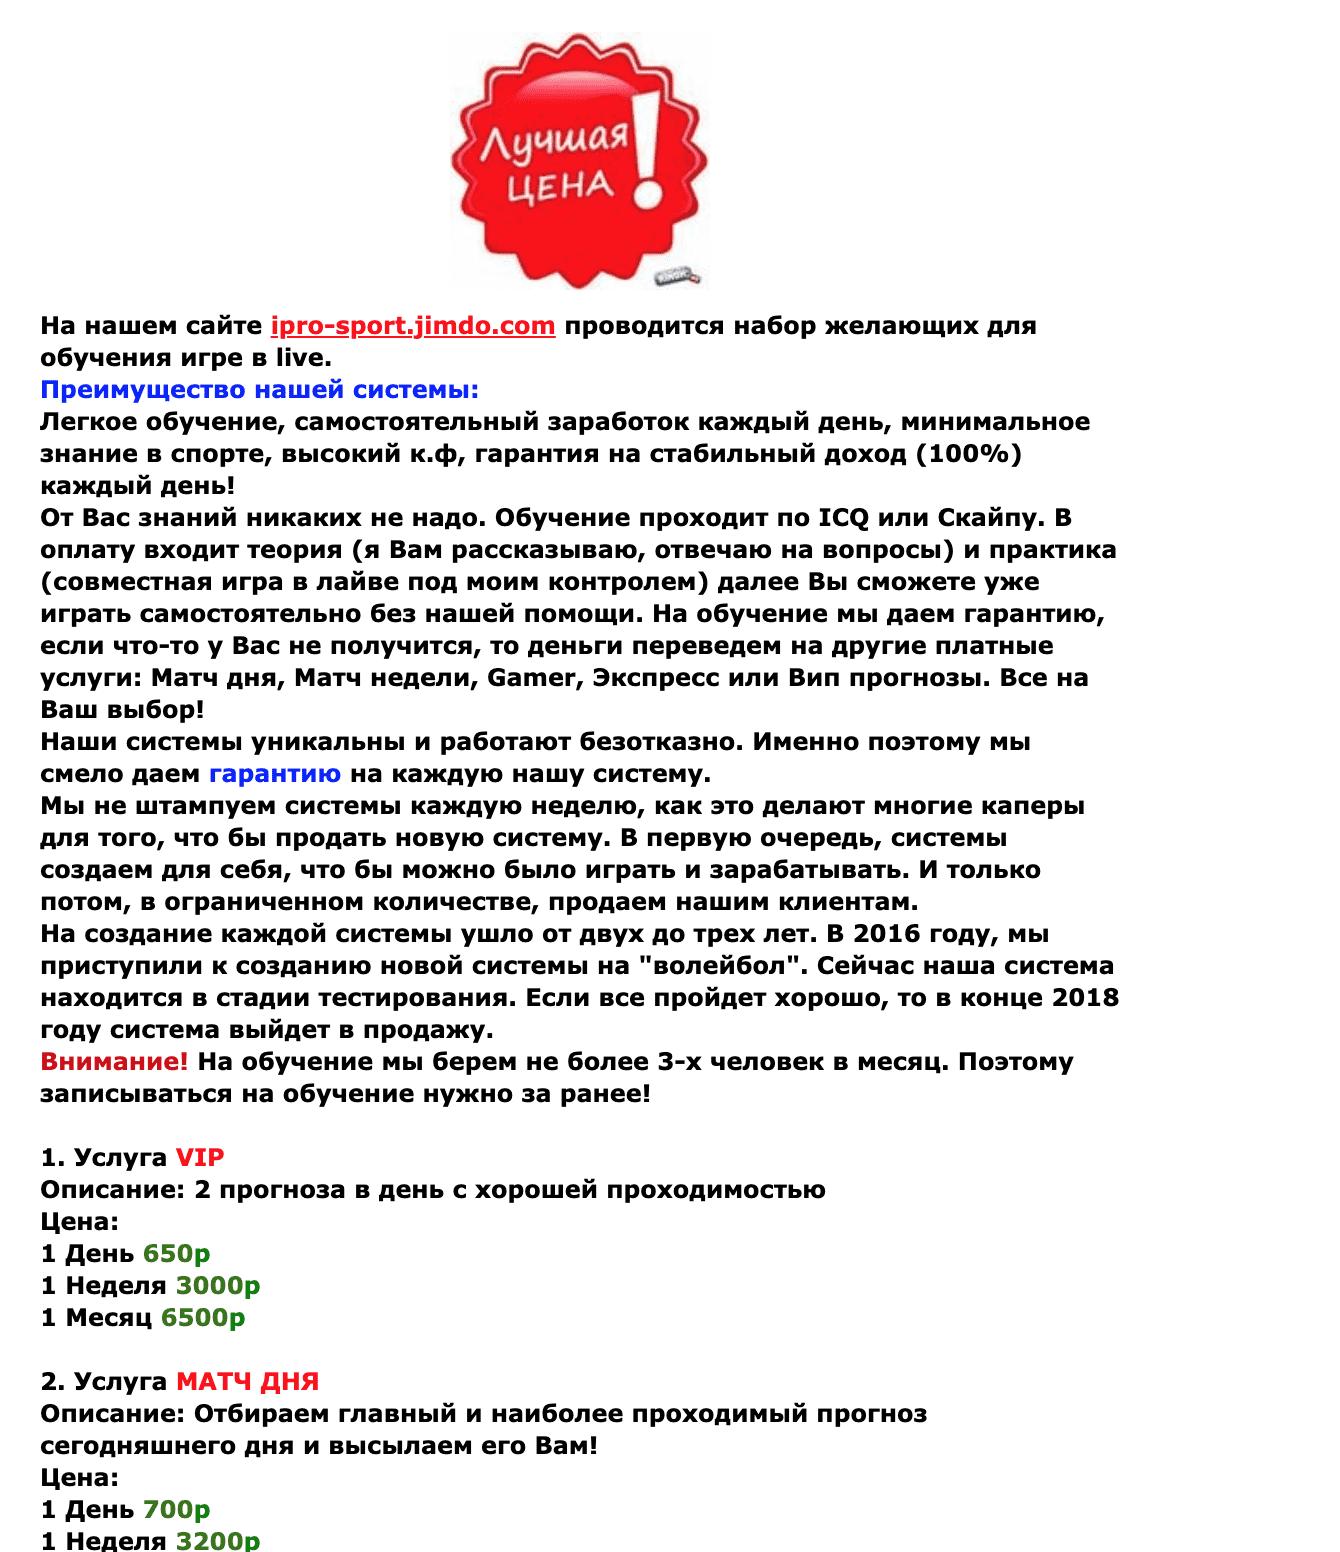 Ценовая политика каппера Ipro Sport Jimdo com